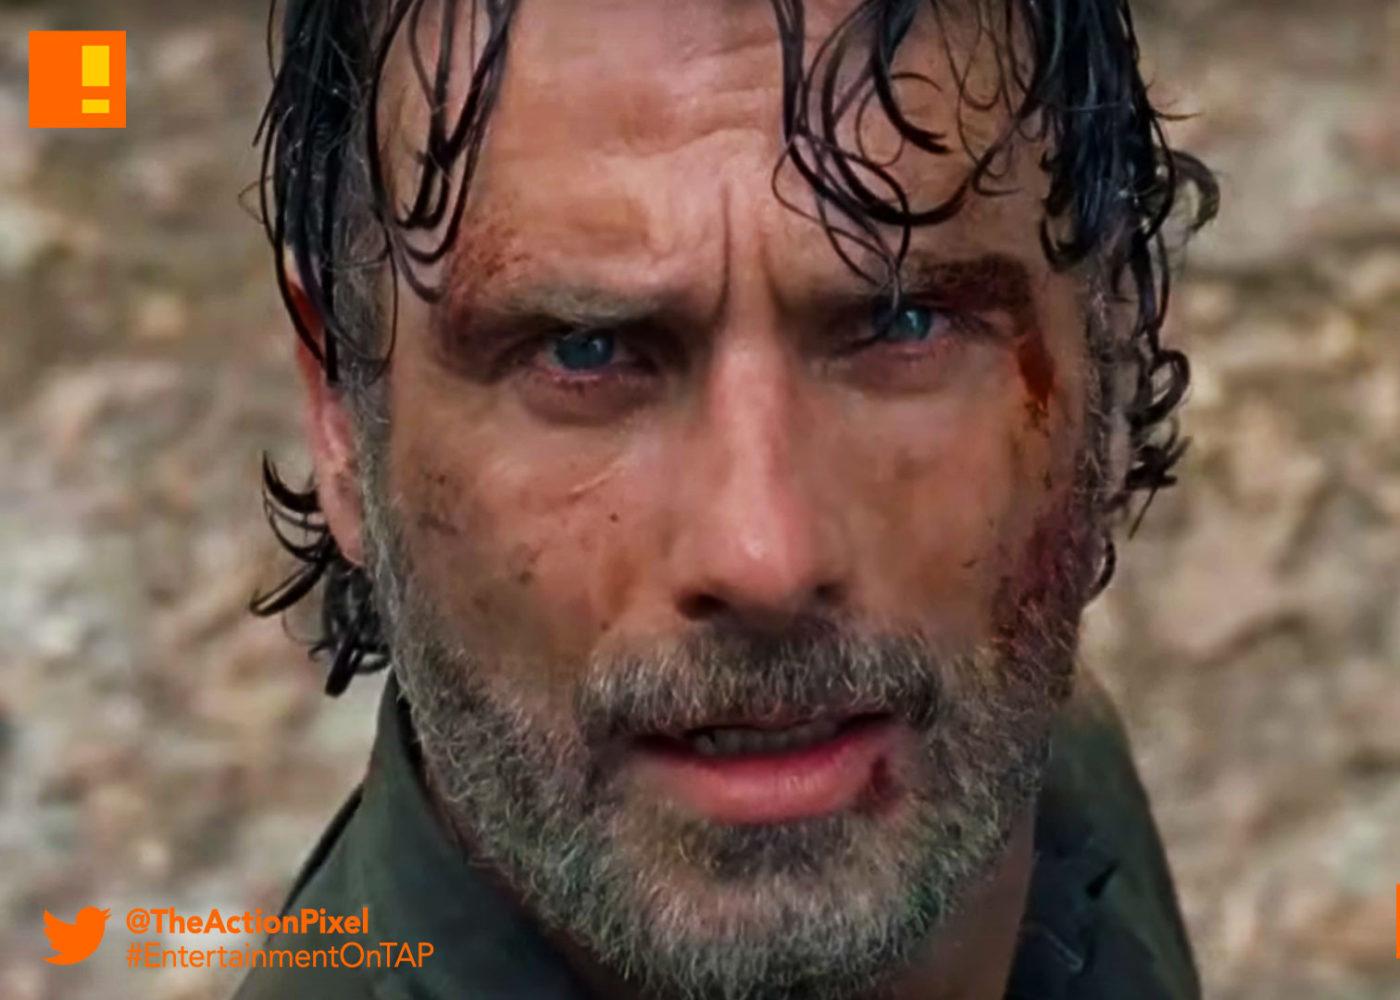 twd, season 8, the walking dead, s 8, negan, the action pixel, the walking dead, entertainment on tap,